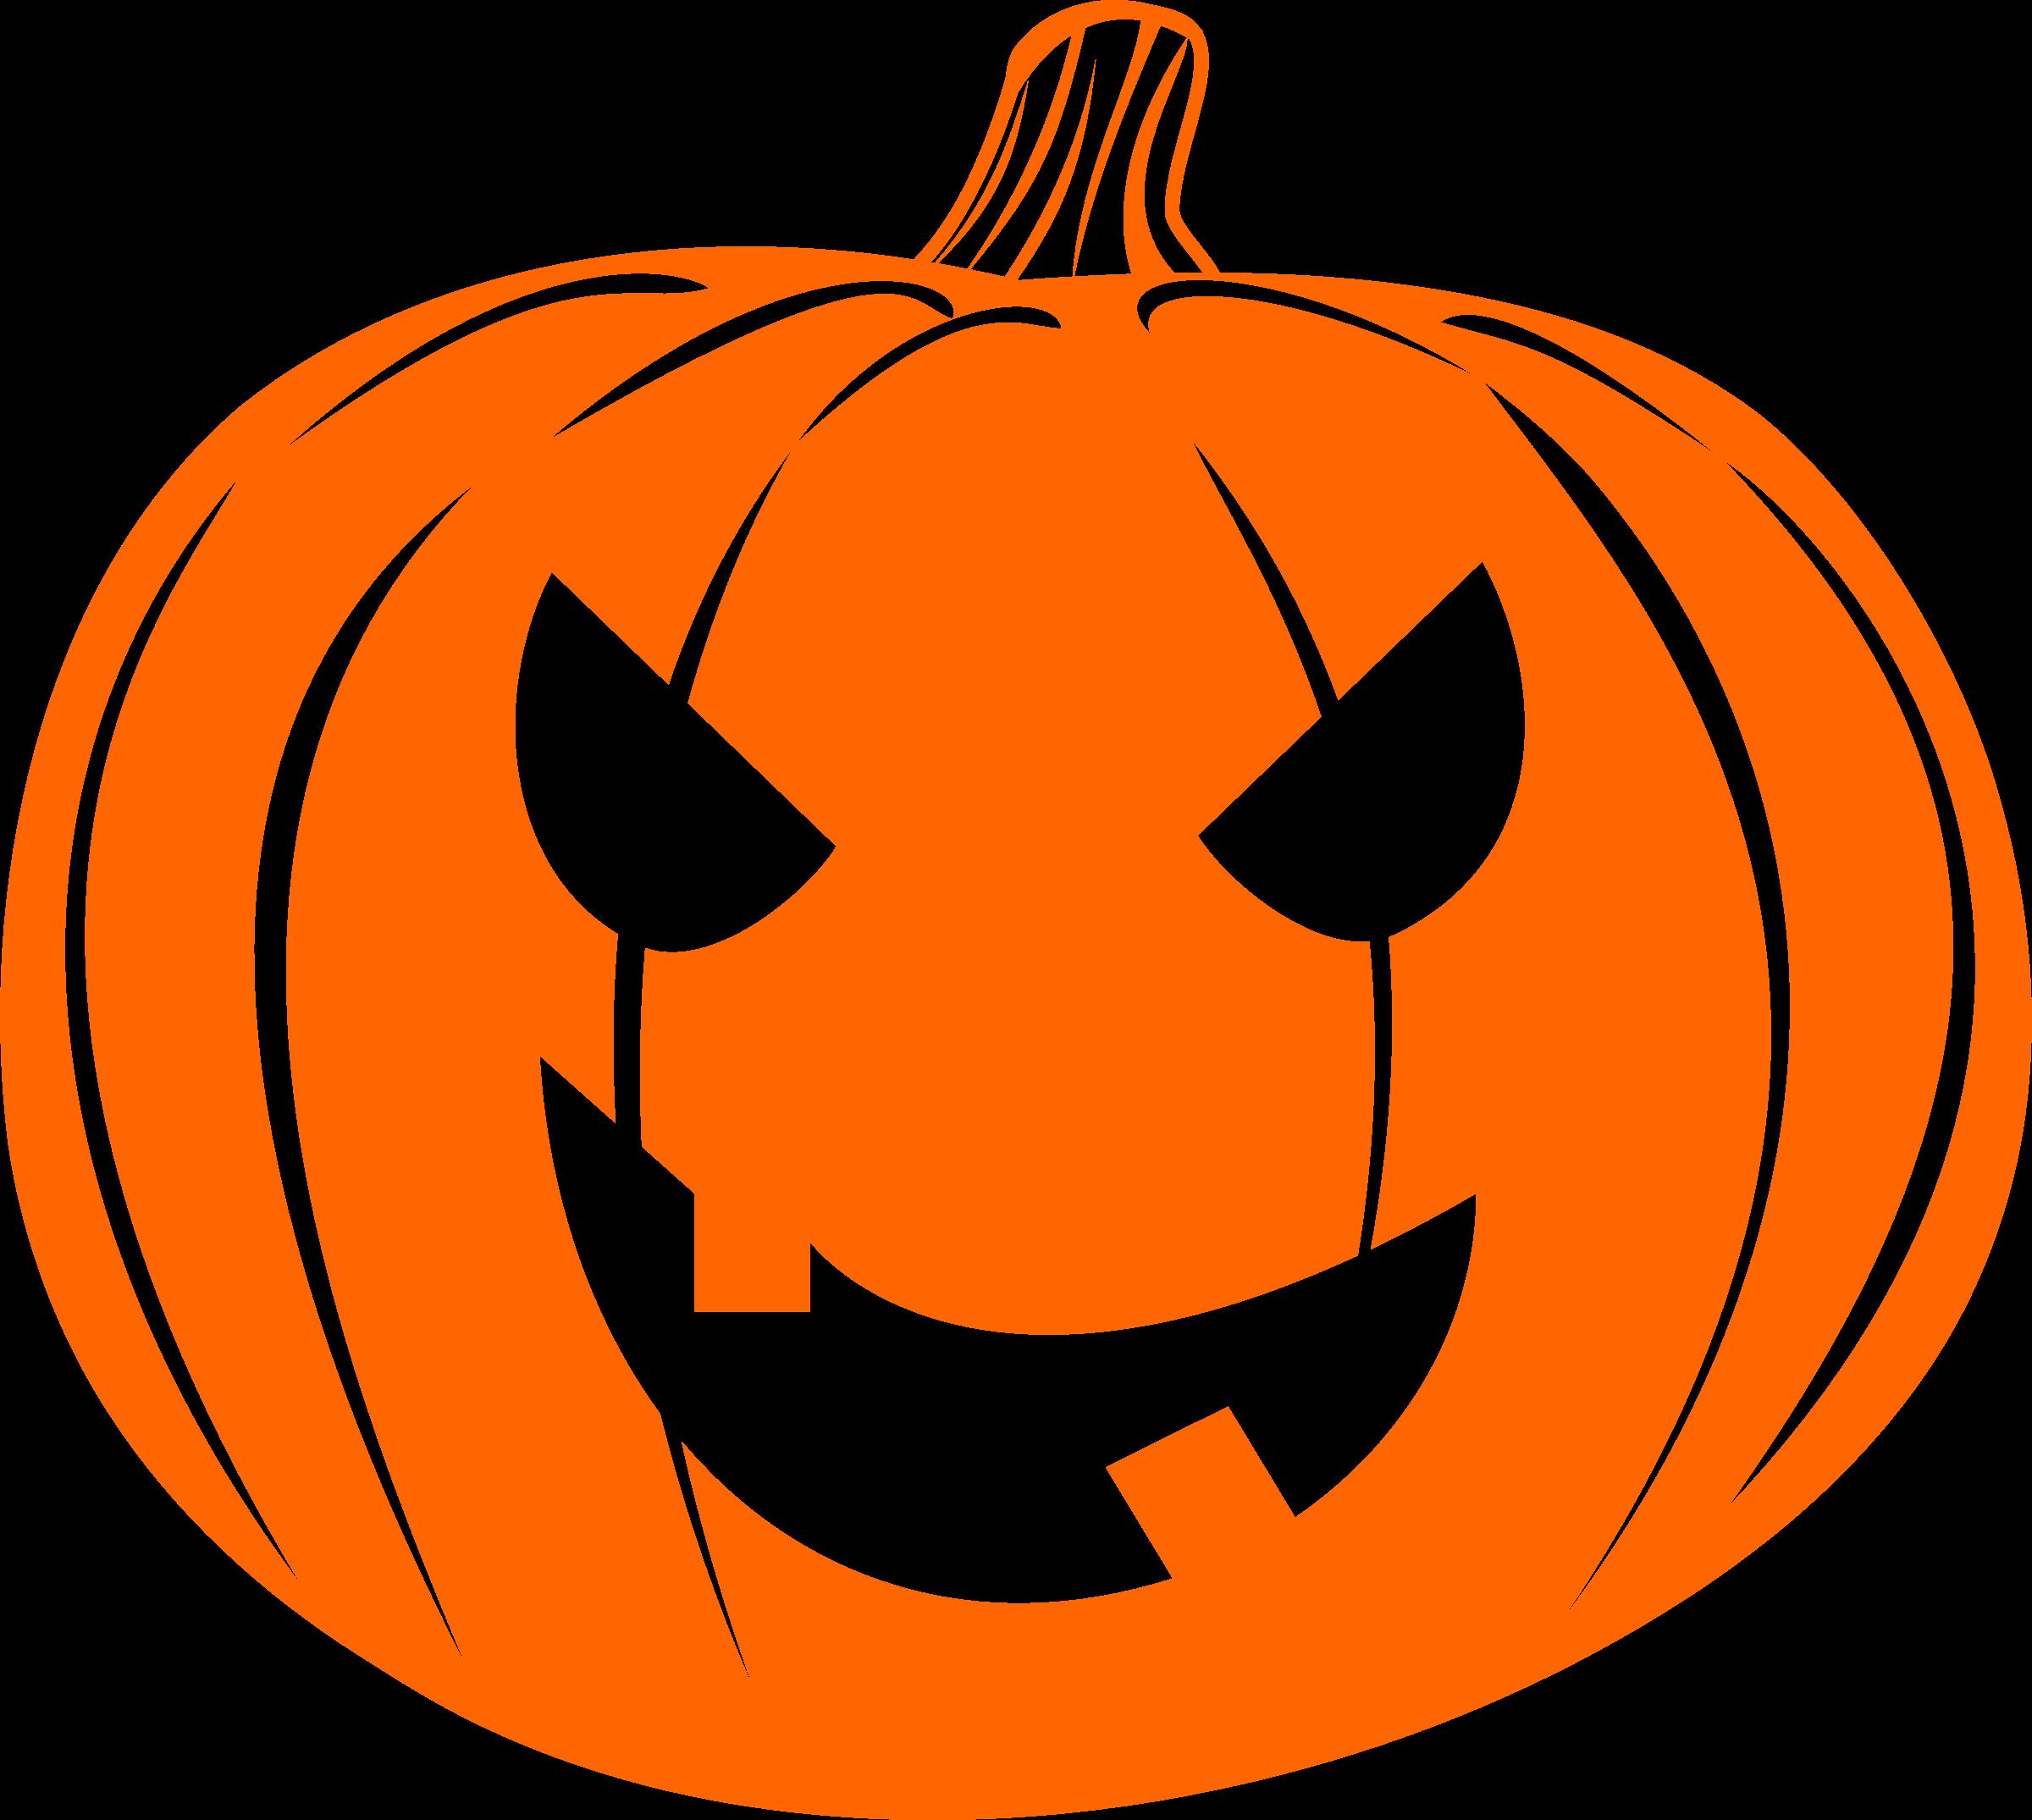 Halloween jack o lantern clipart vector free stock Clipart - Jack-o'-lantern orange vector free stock